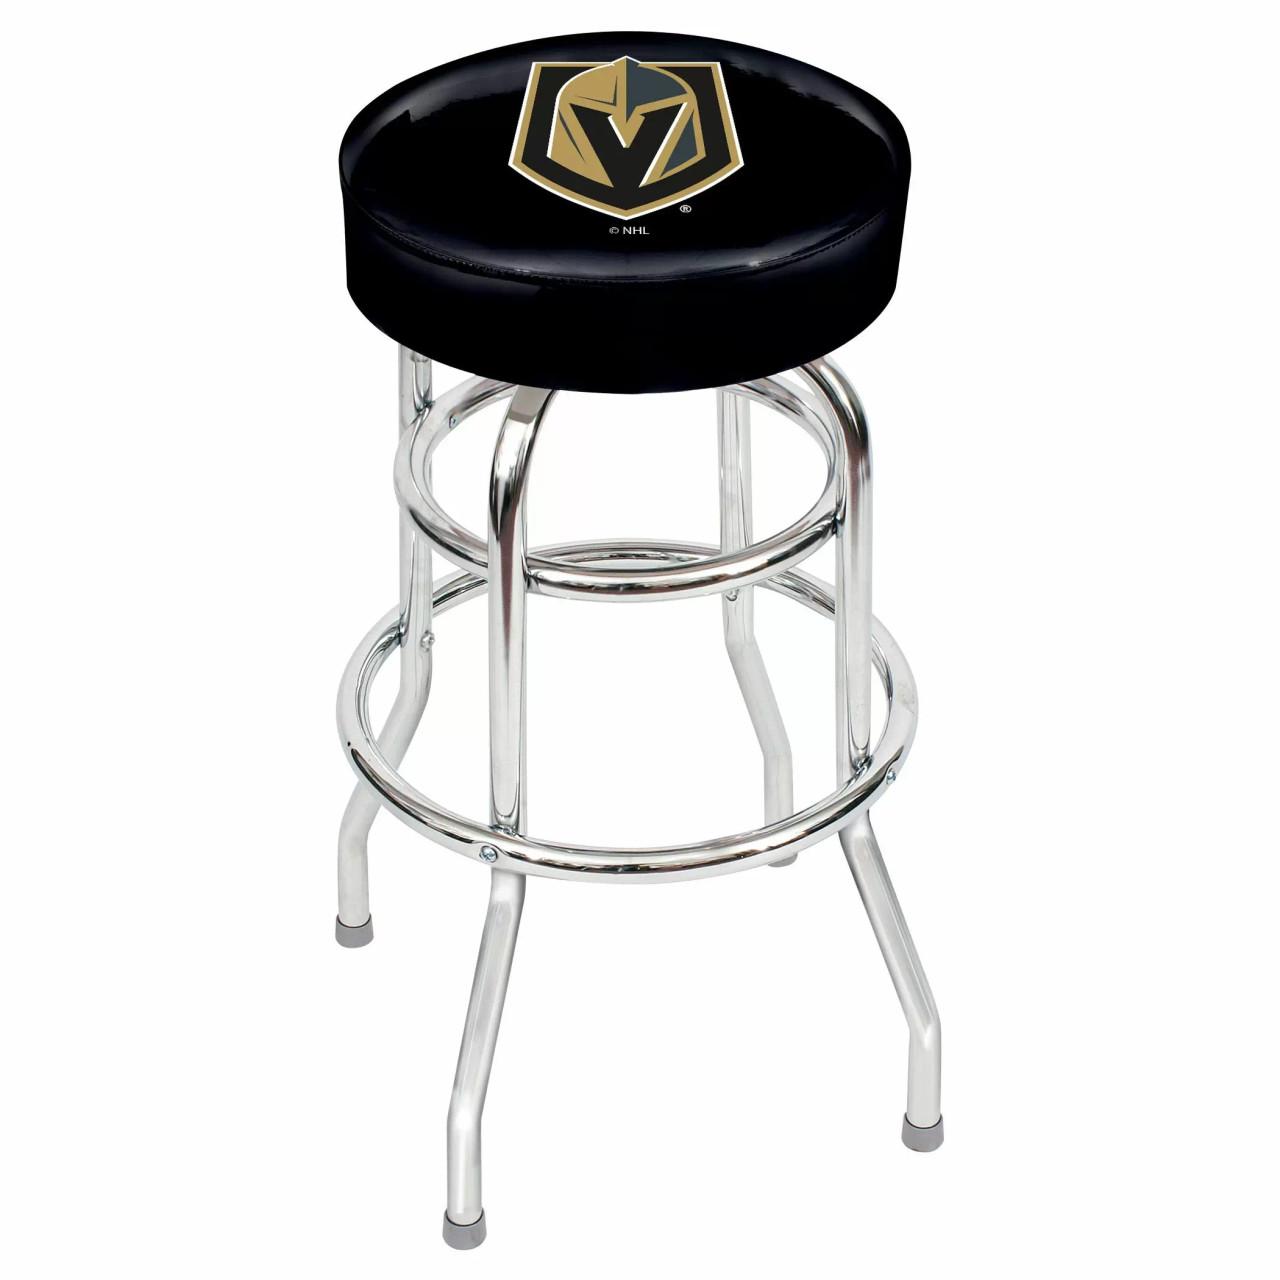 "61-5032, Las, Vegas, Golden, Knights, 30"", Chrome, Bar, Stool, NHL"